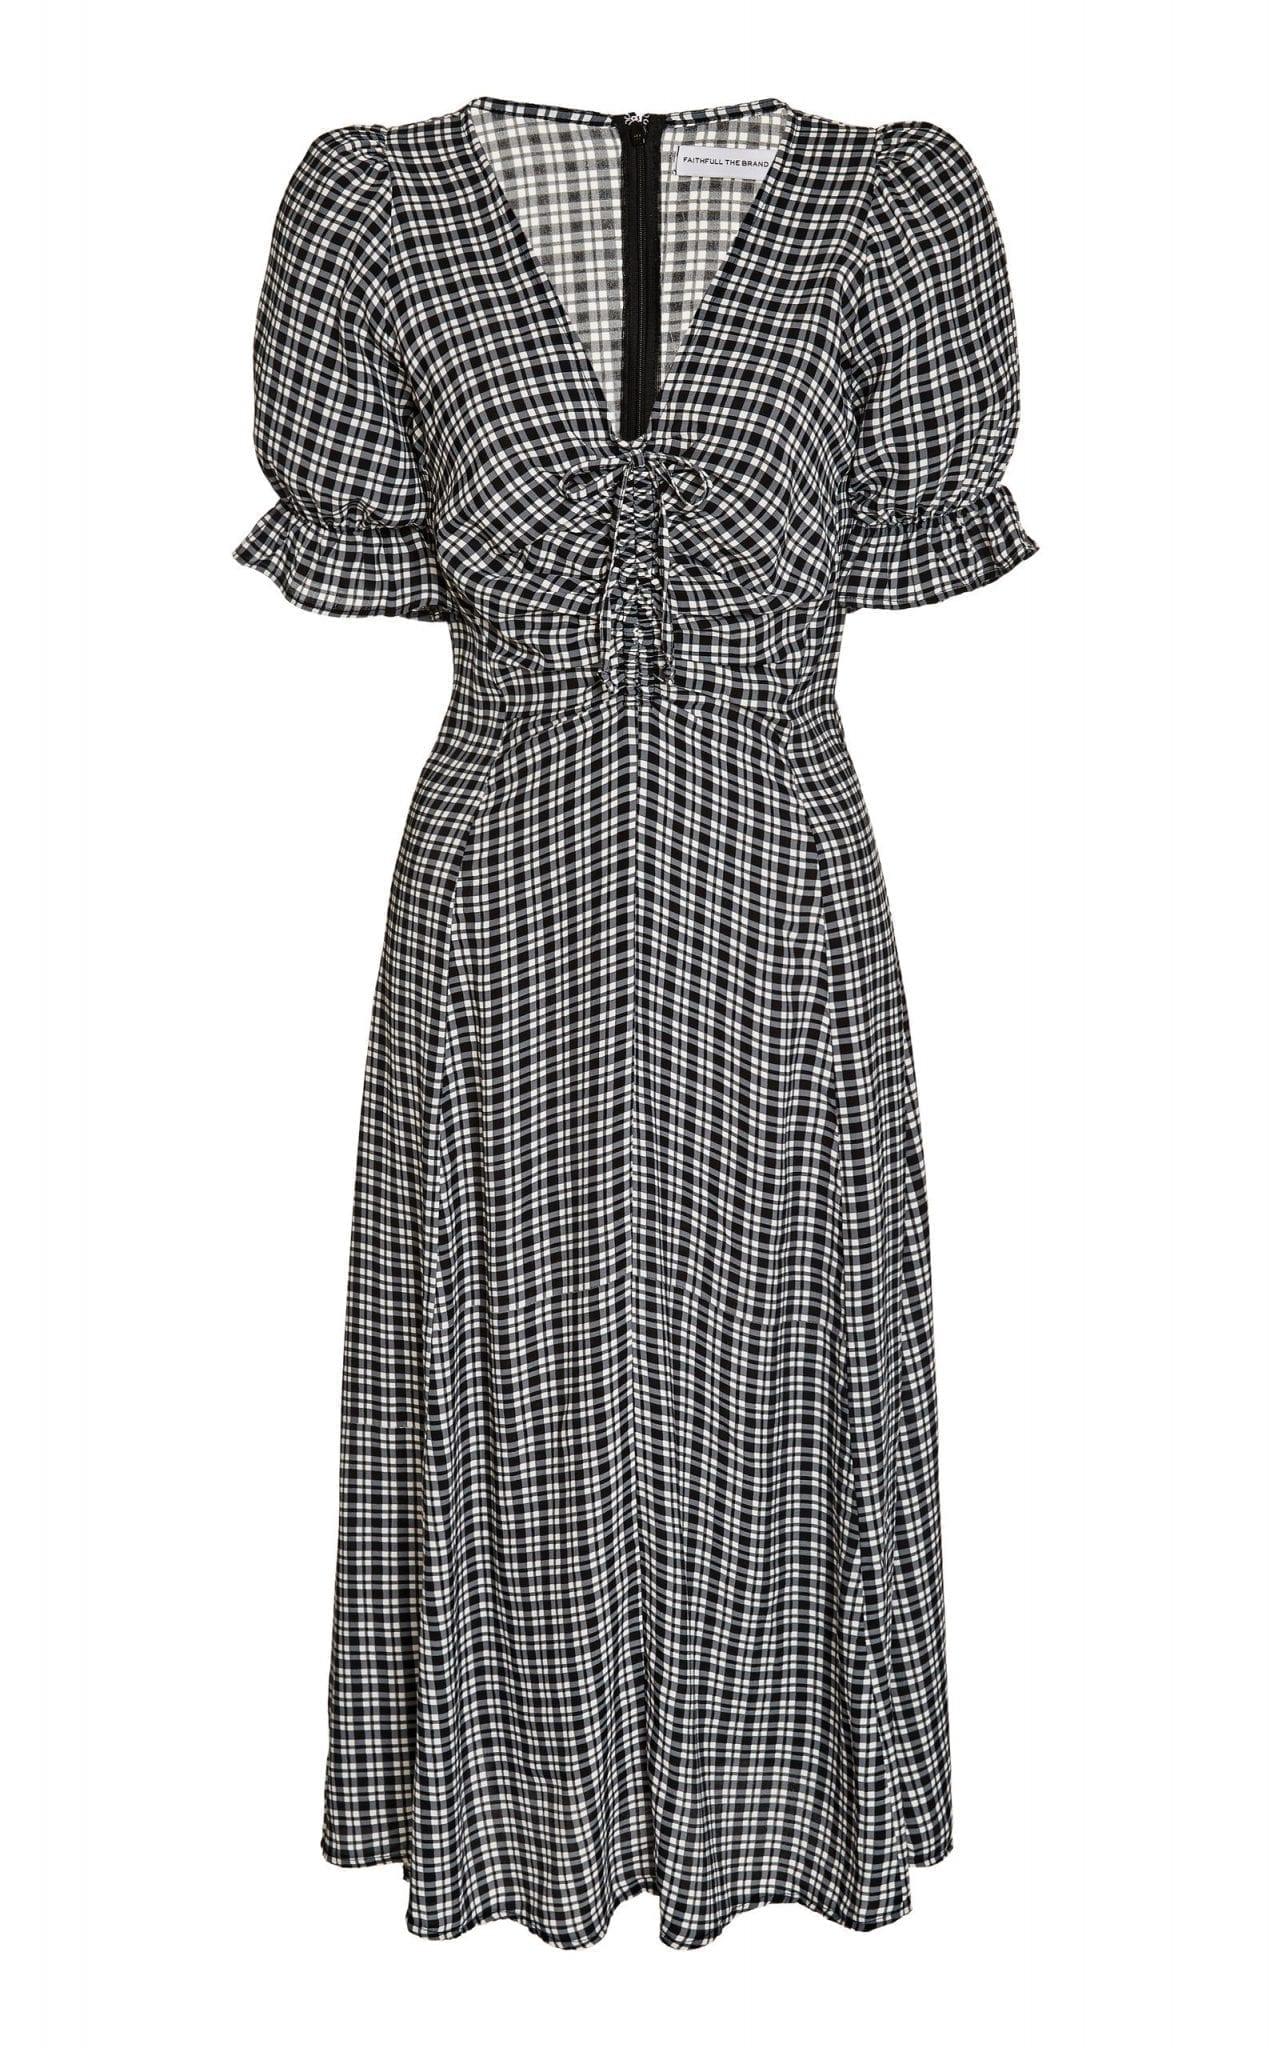 FAITHFULL THE BRAND Amber Ruched Check-Print Crepe Midi Dress